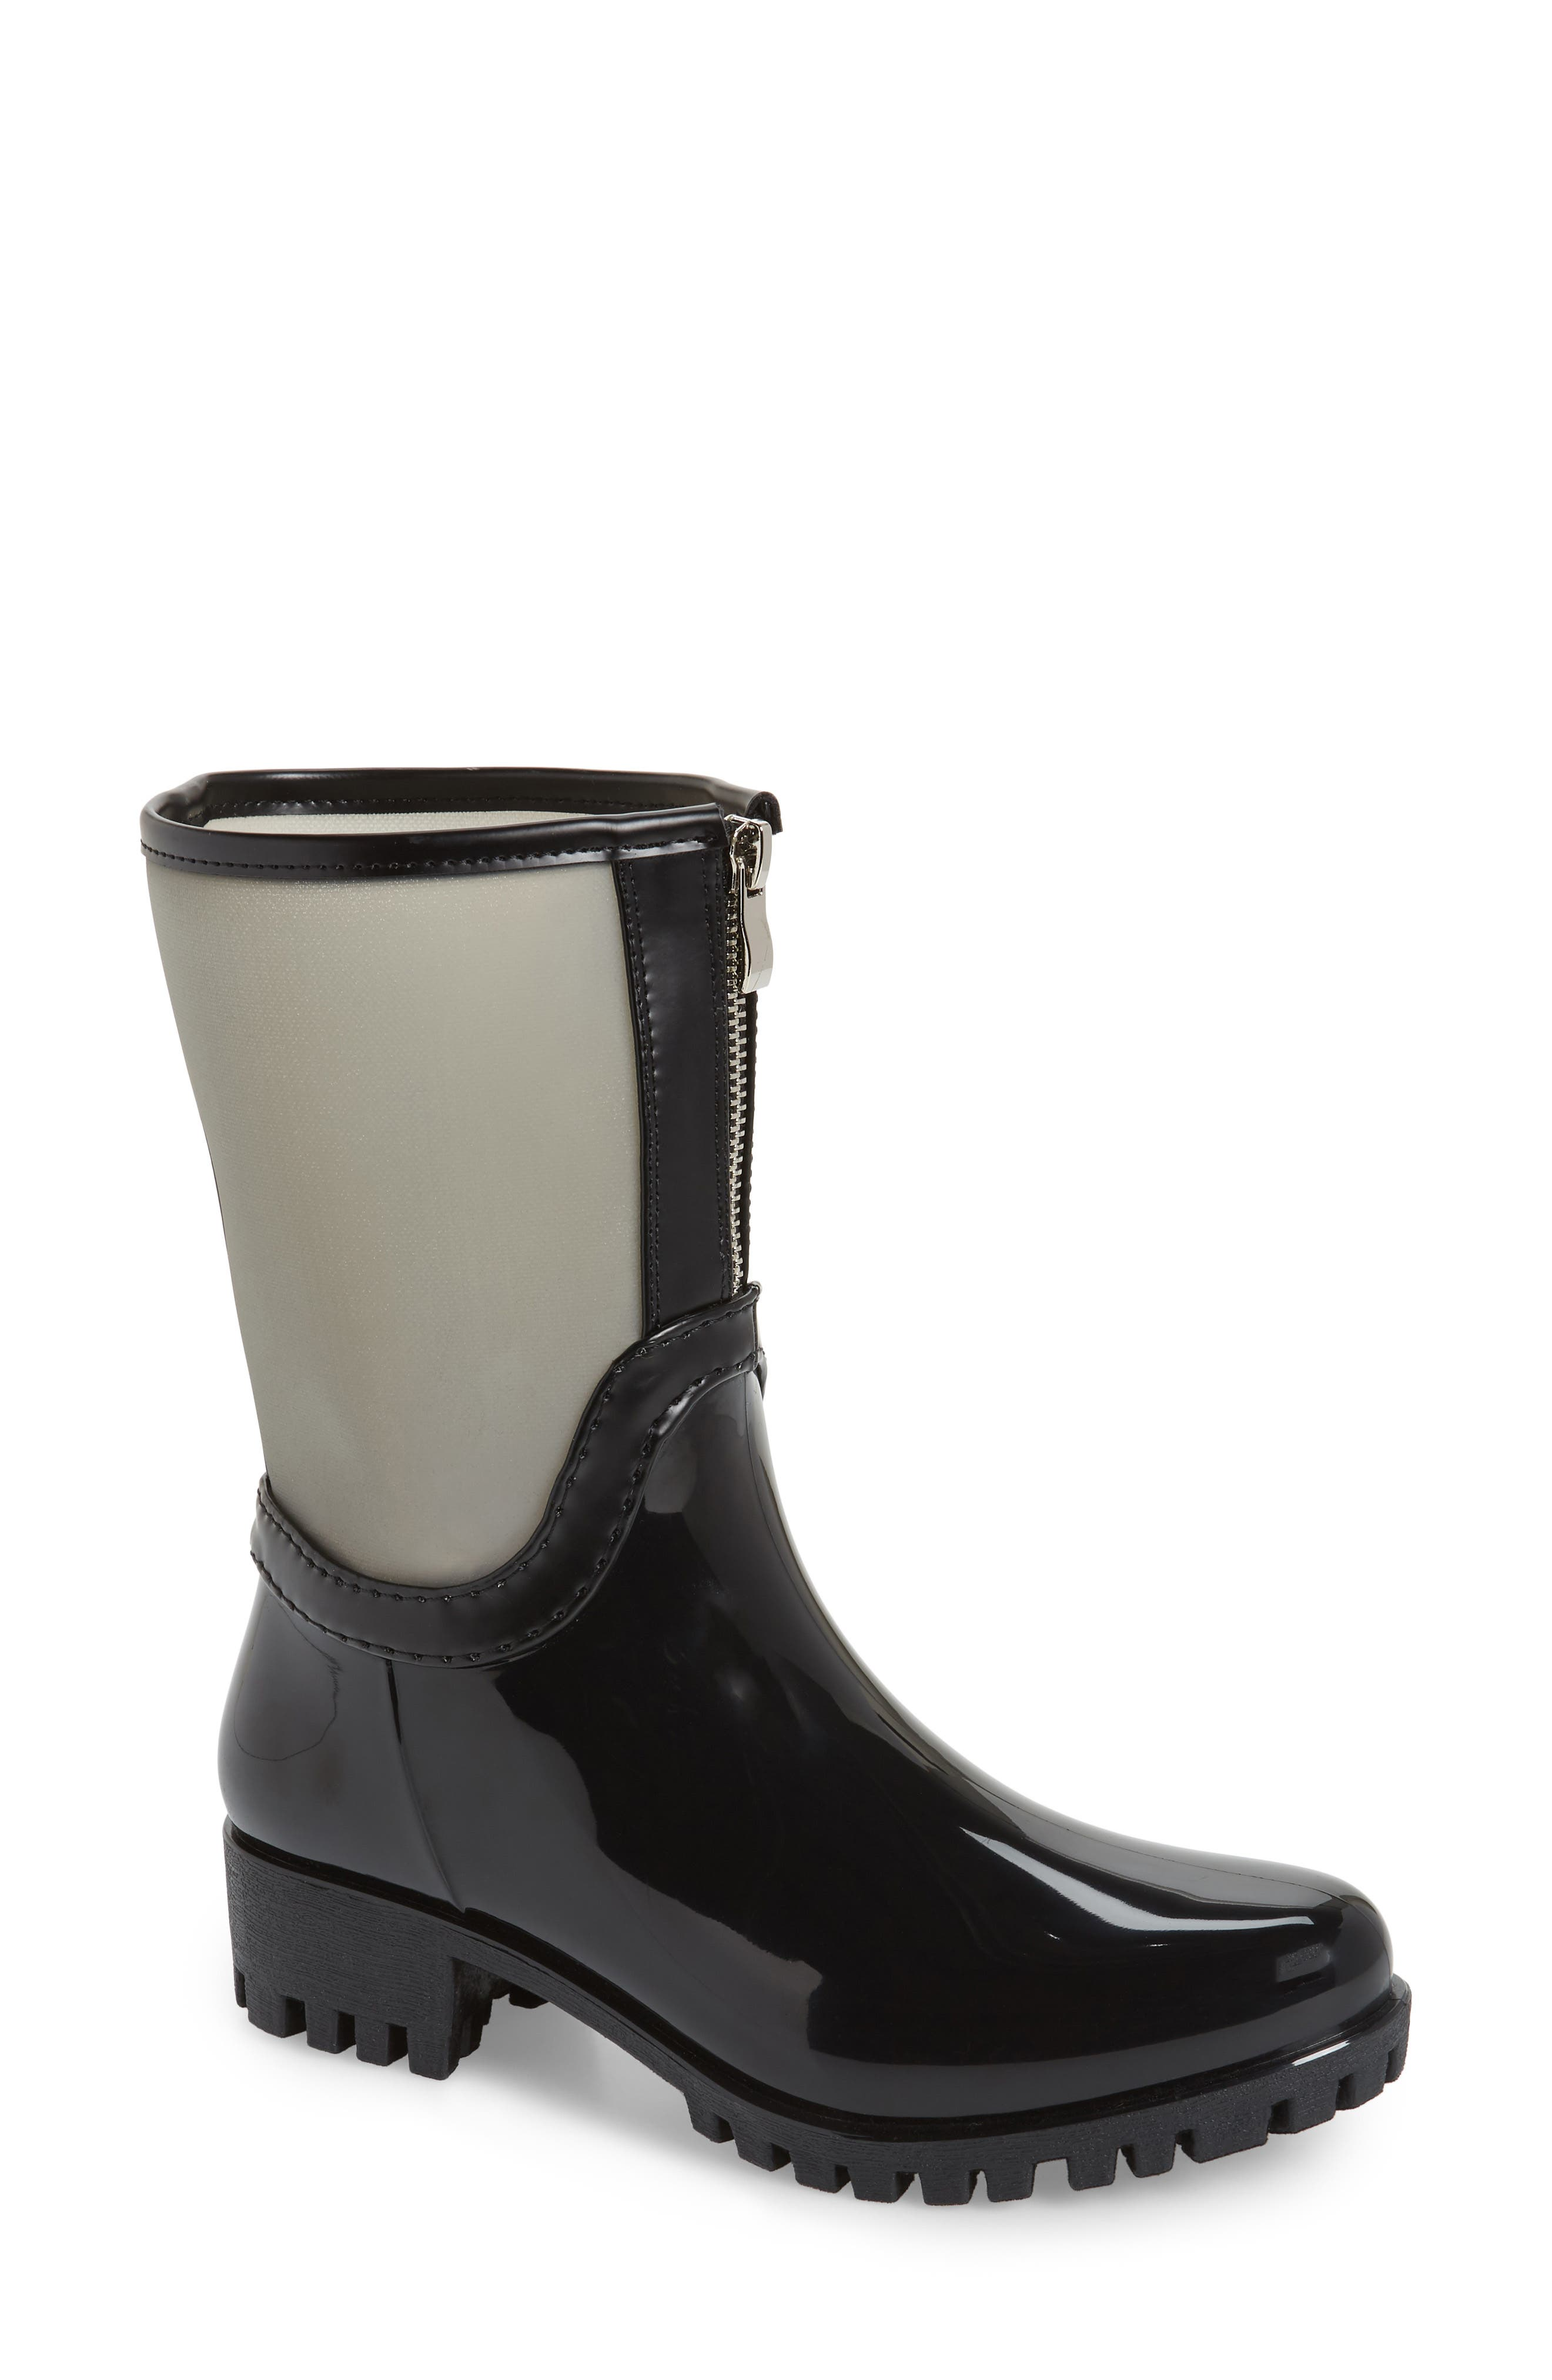 DÄV Dryden Sheer Waterproof Boot, Main, color, GREY FABRIC